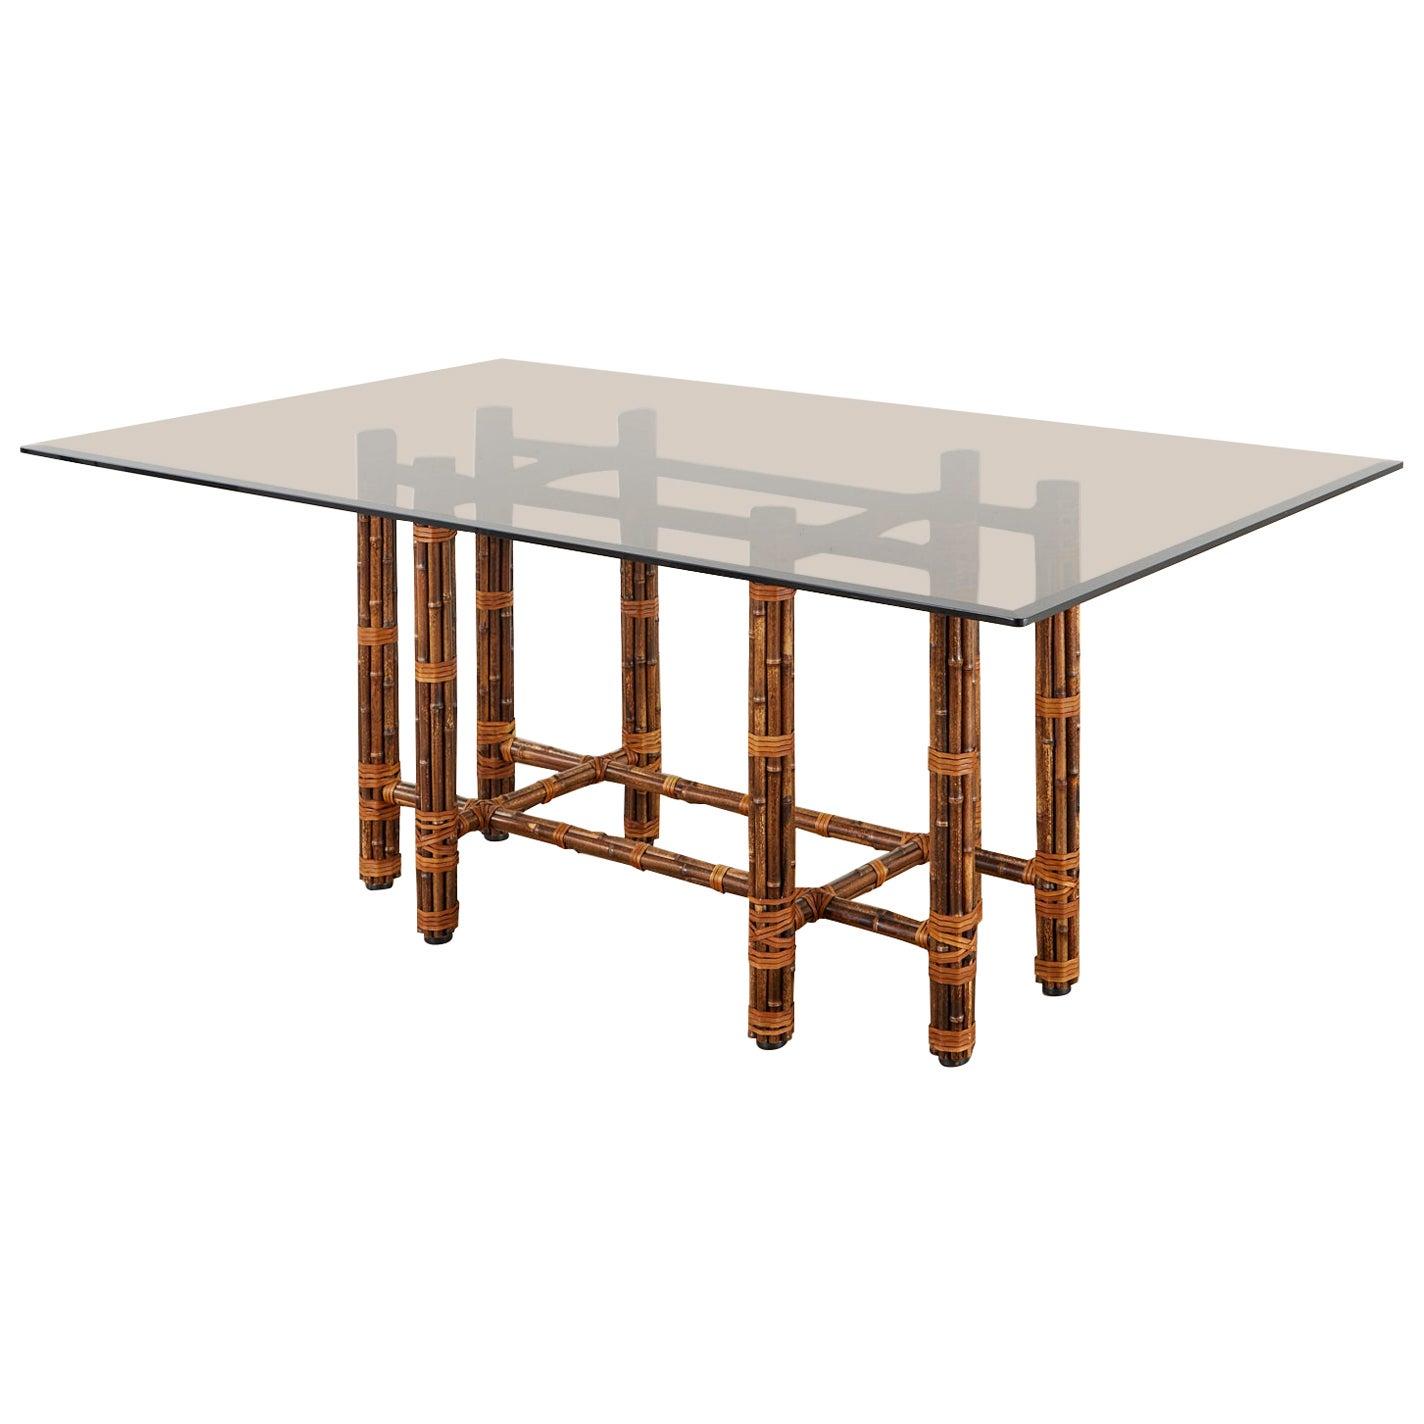 McGuire California Modern Rectangular Bamboo Rattan Dining Table